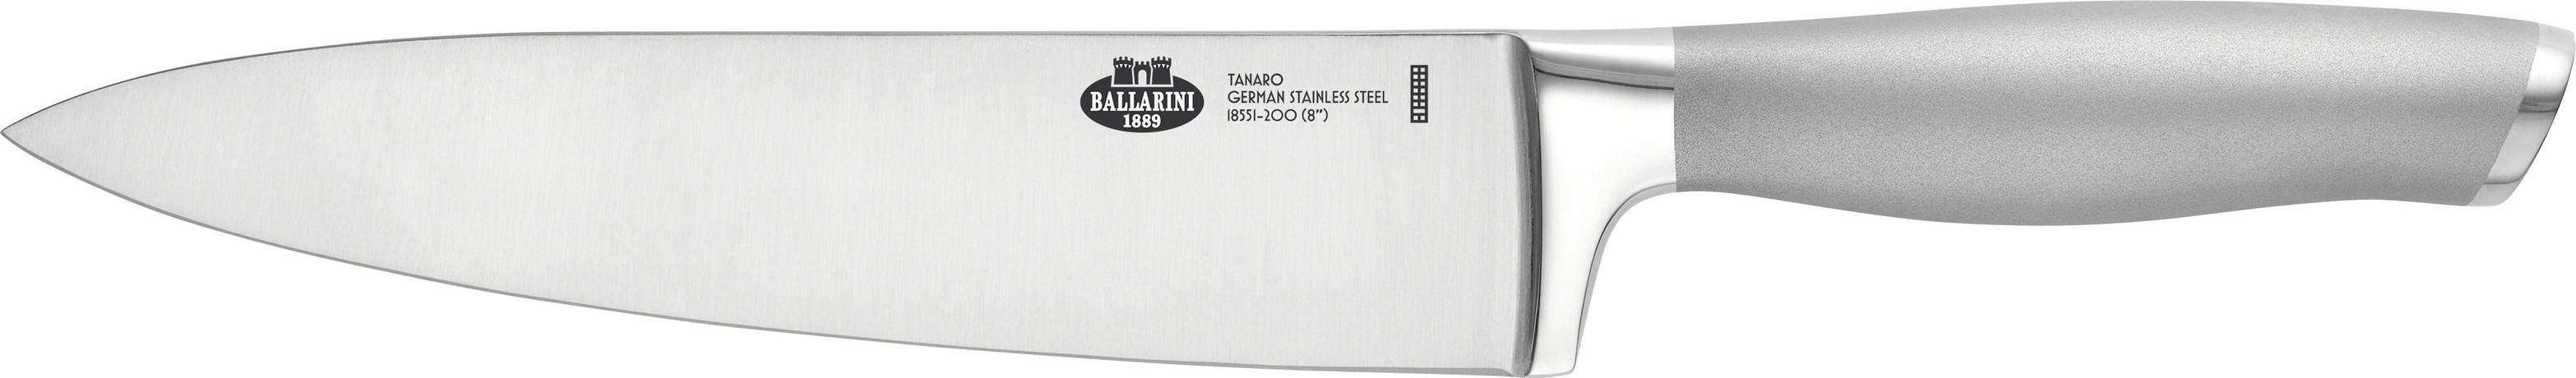 Buy the Ballarini Tanaro Chef's Knife online at smithswofloughton.com